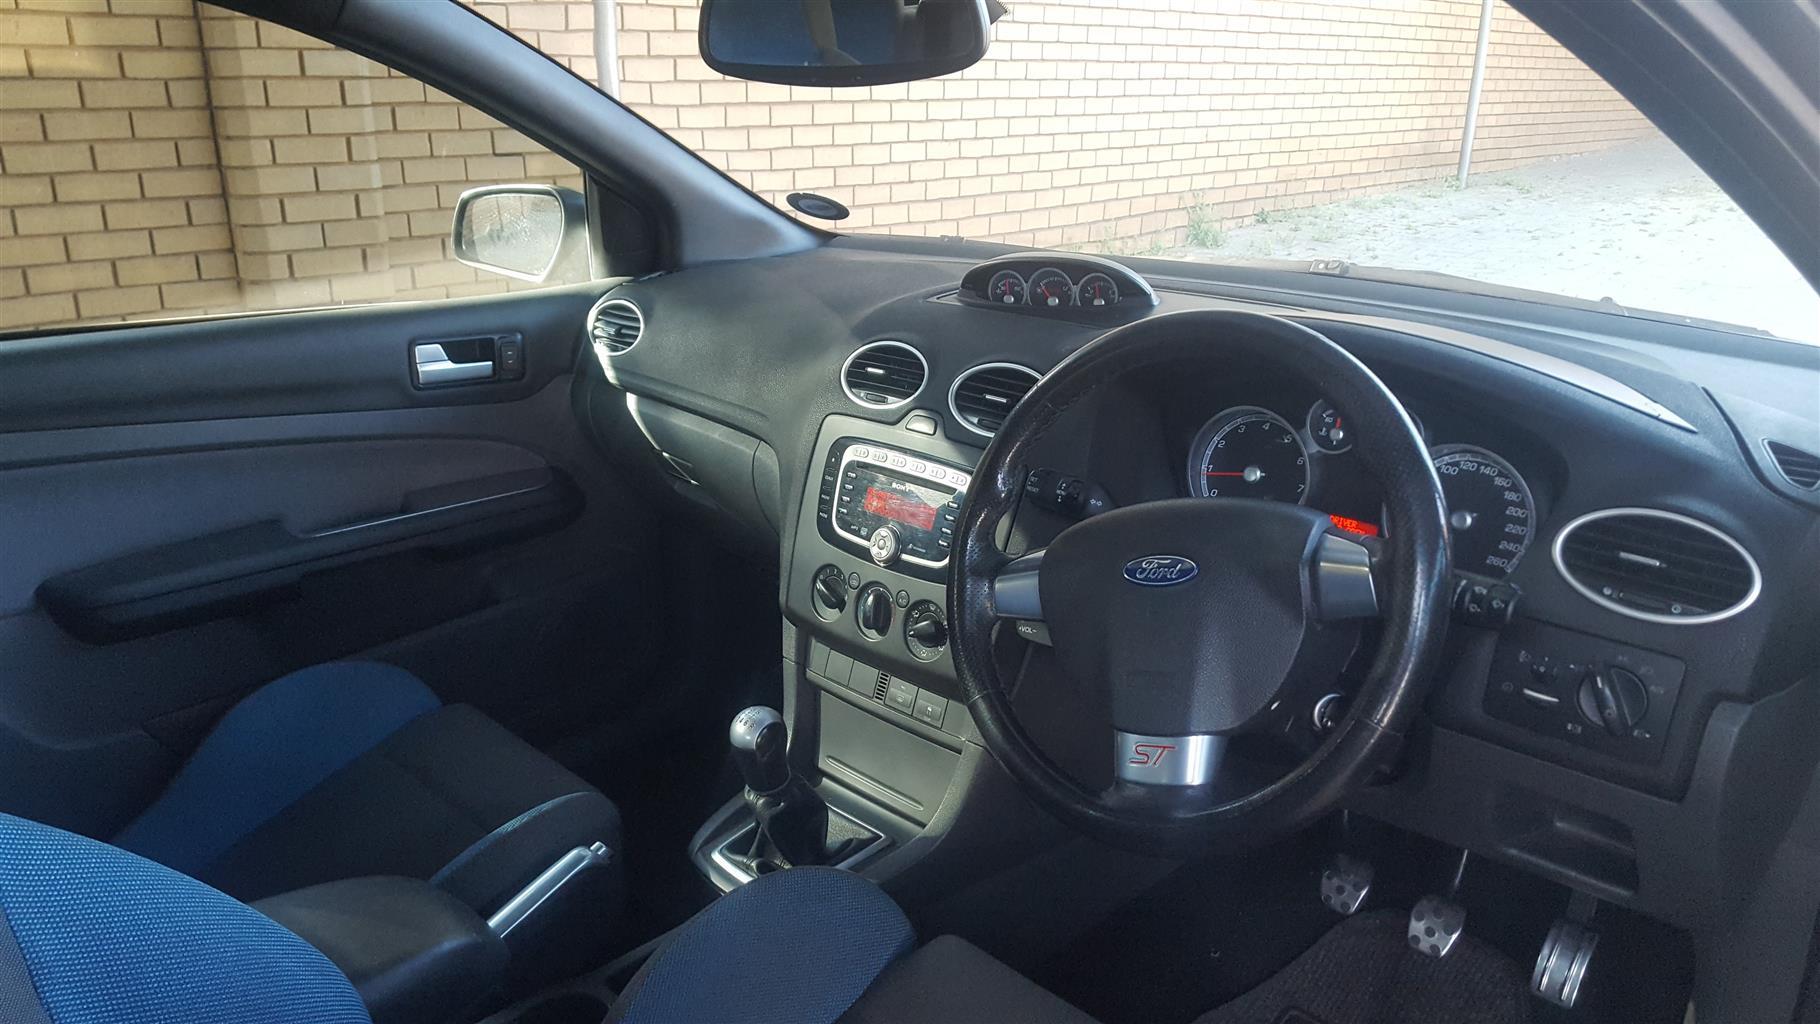 2008 Ford Focus hatch 3-door FOCUS 2.5 ST 3Dr